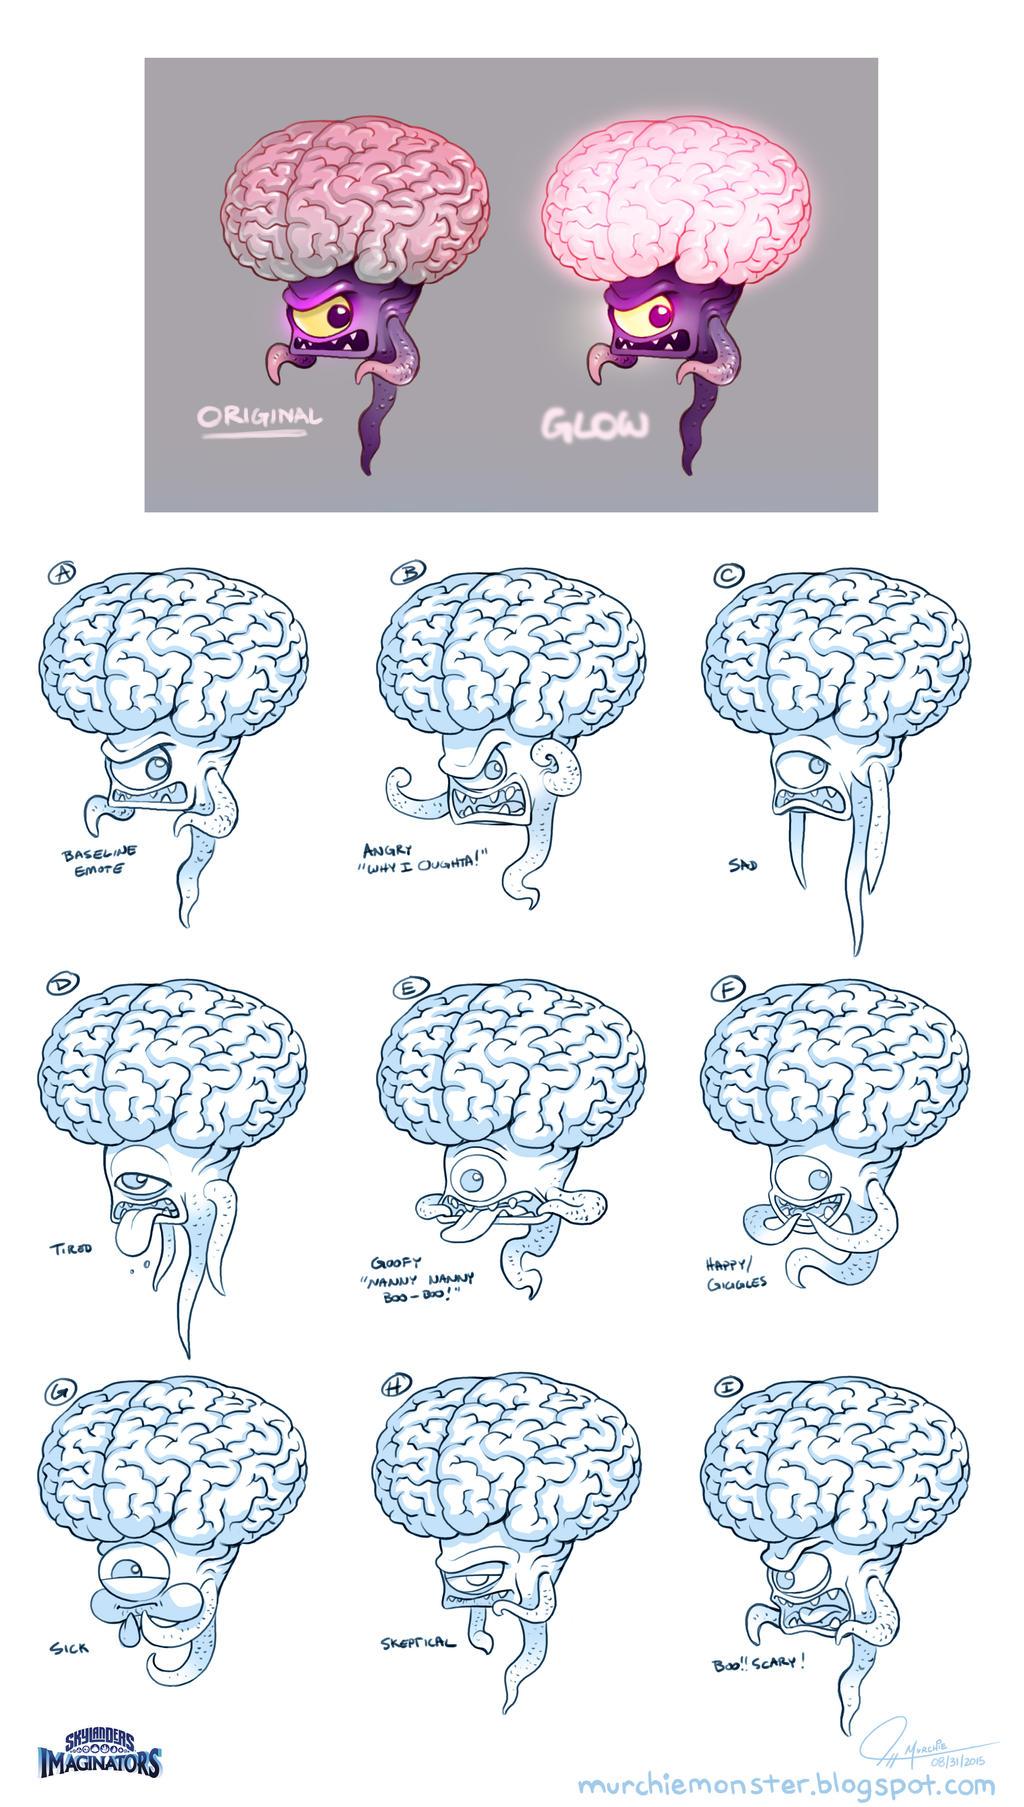 [Image: skylanders_imaginators_brain_concept_by_...an4yi2.jpg]